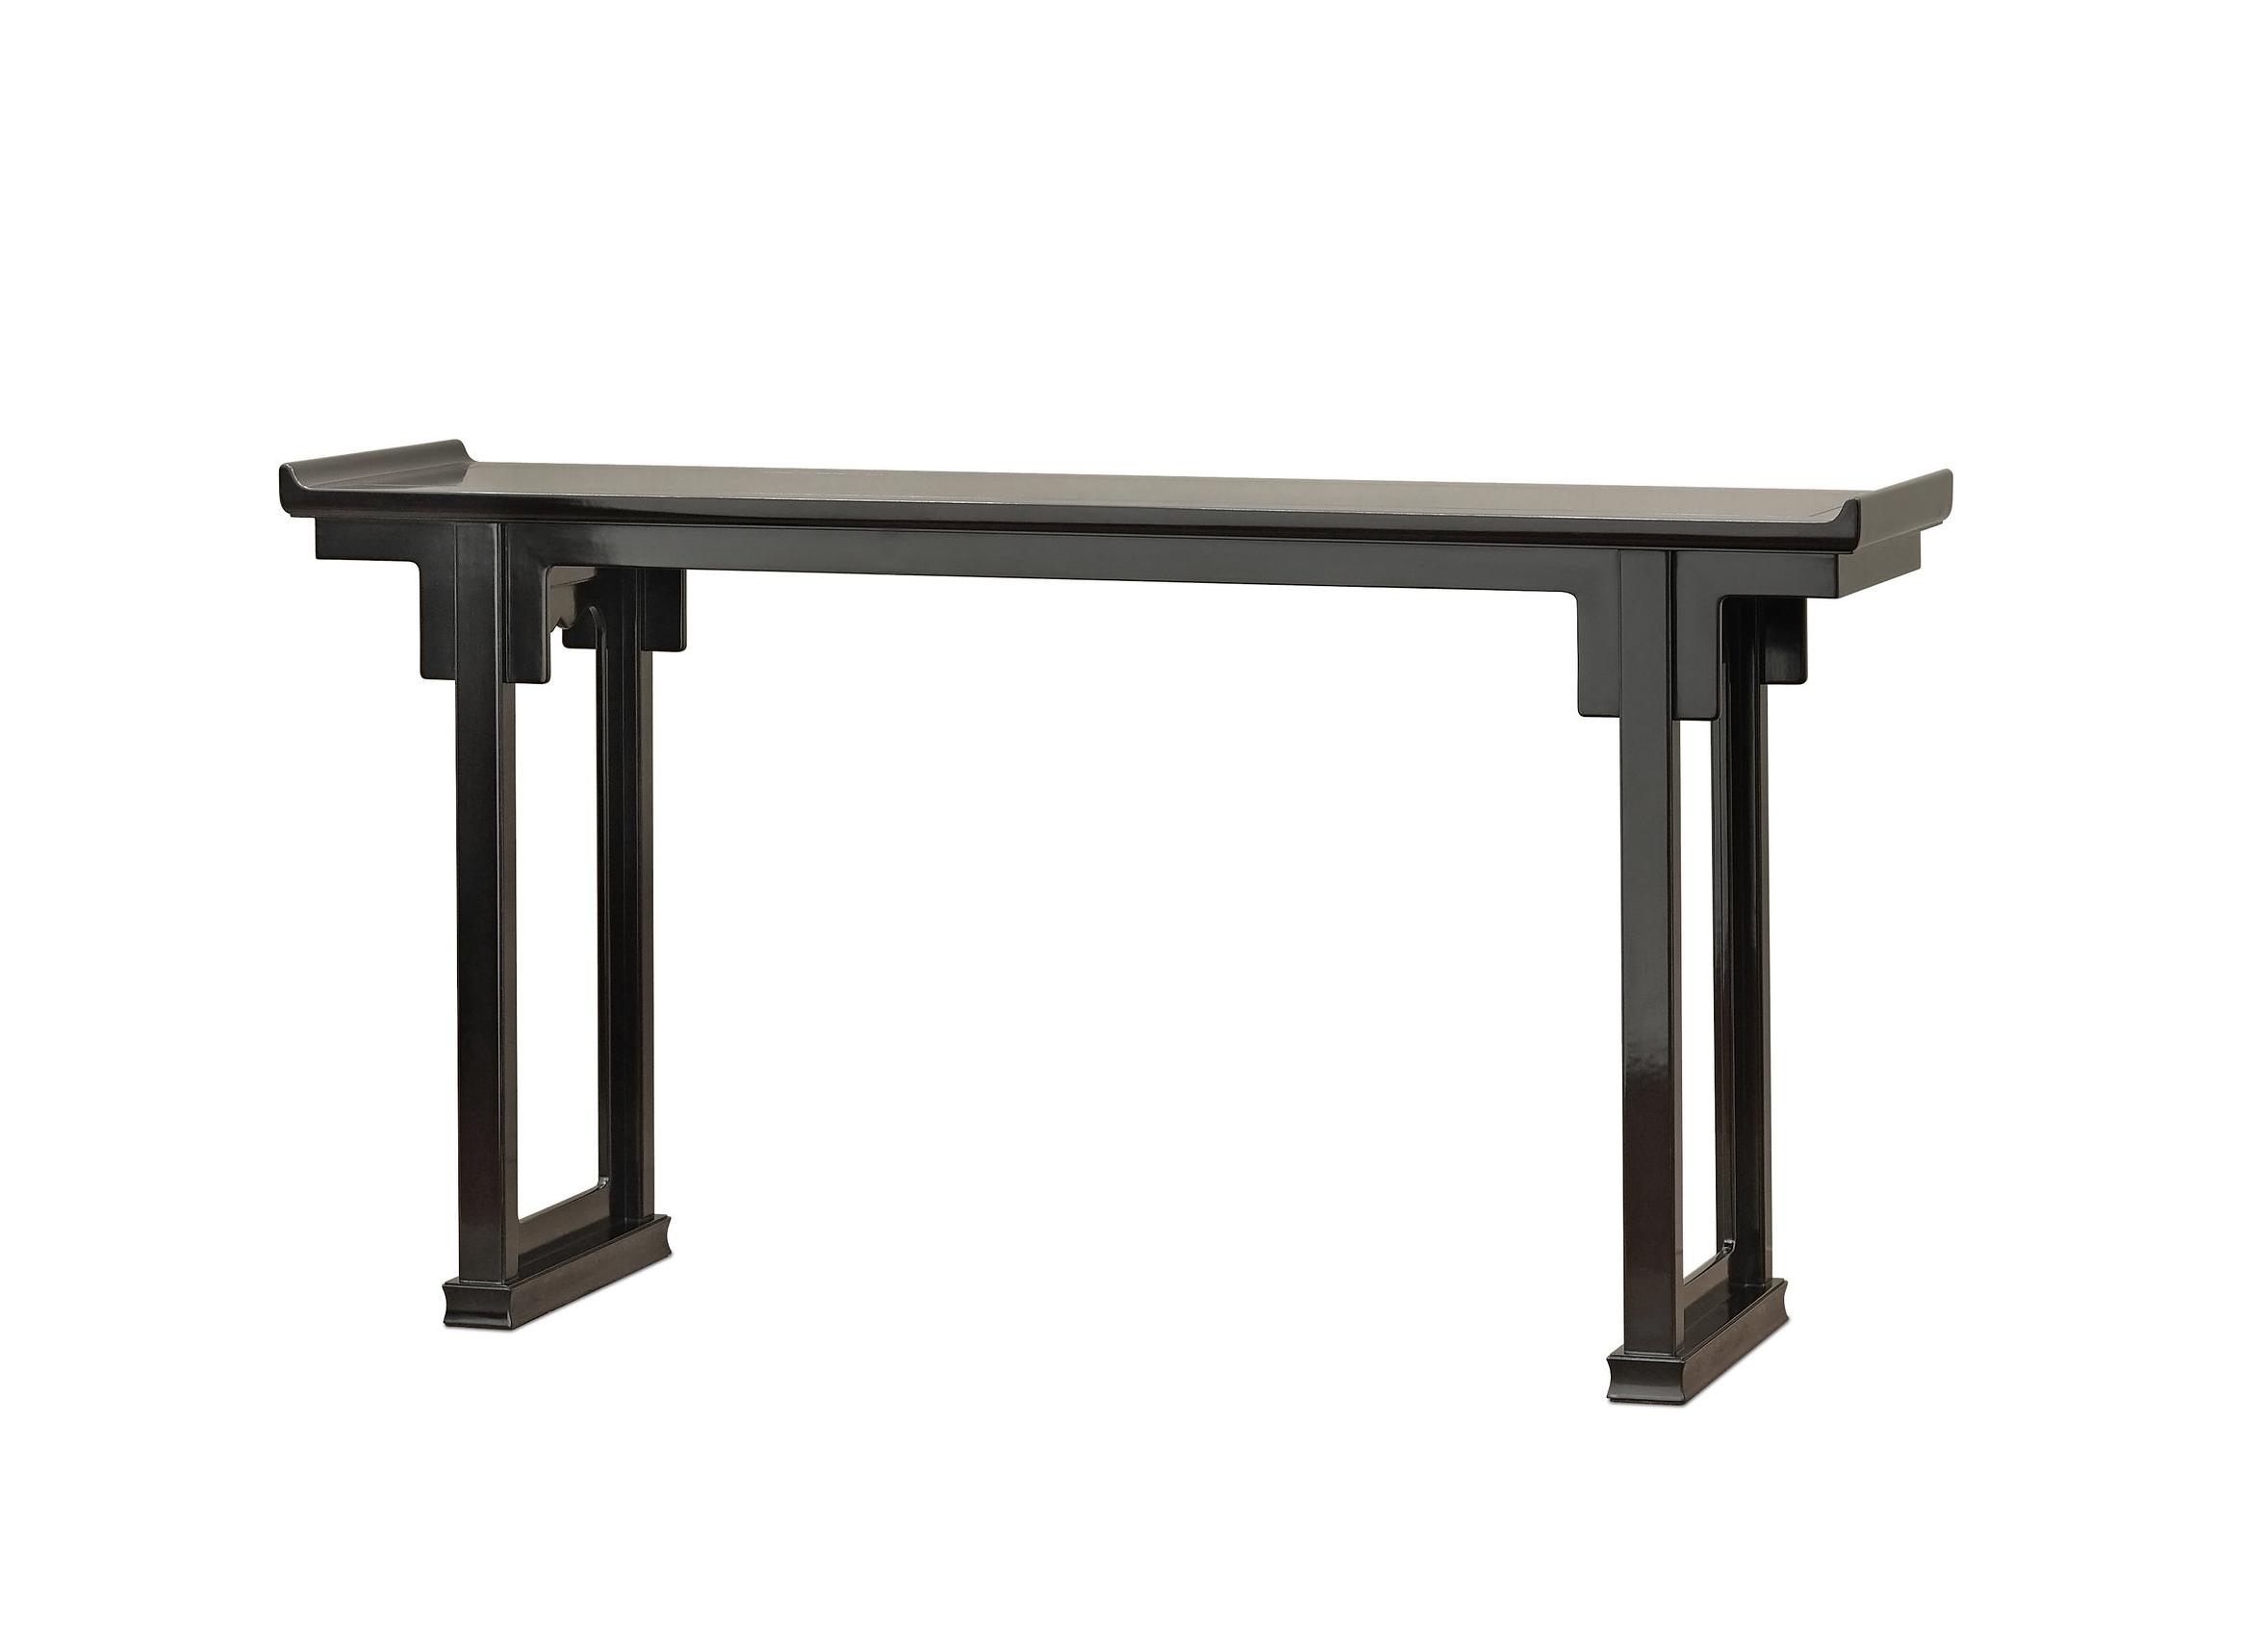 ....chinese ming style furniture : side table ..中式明式家具 : 条桌....